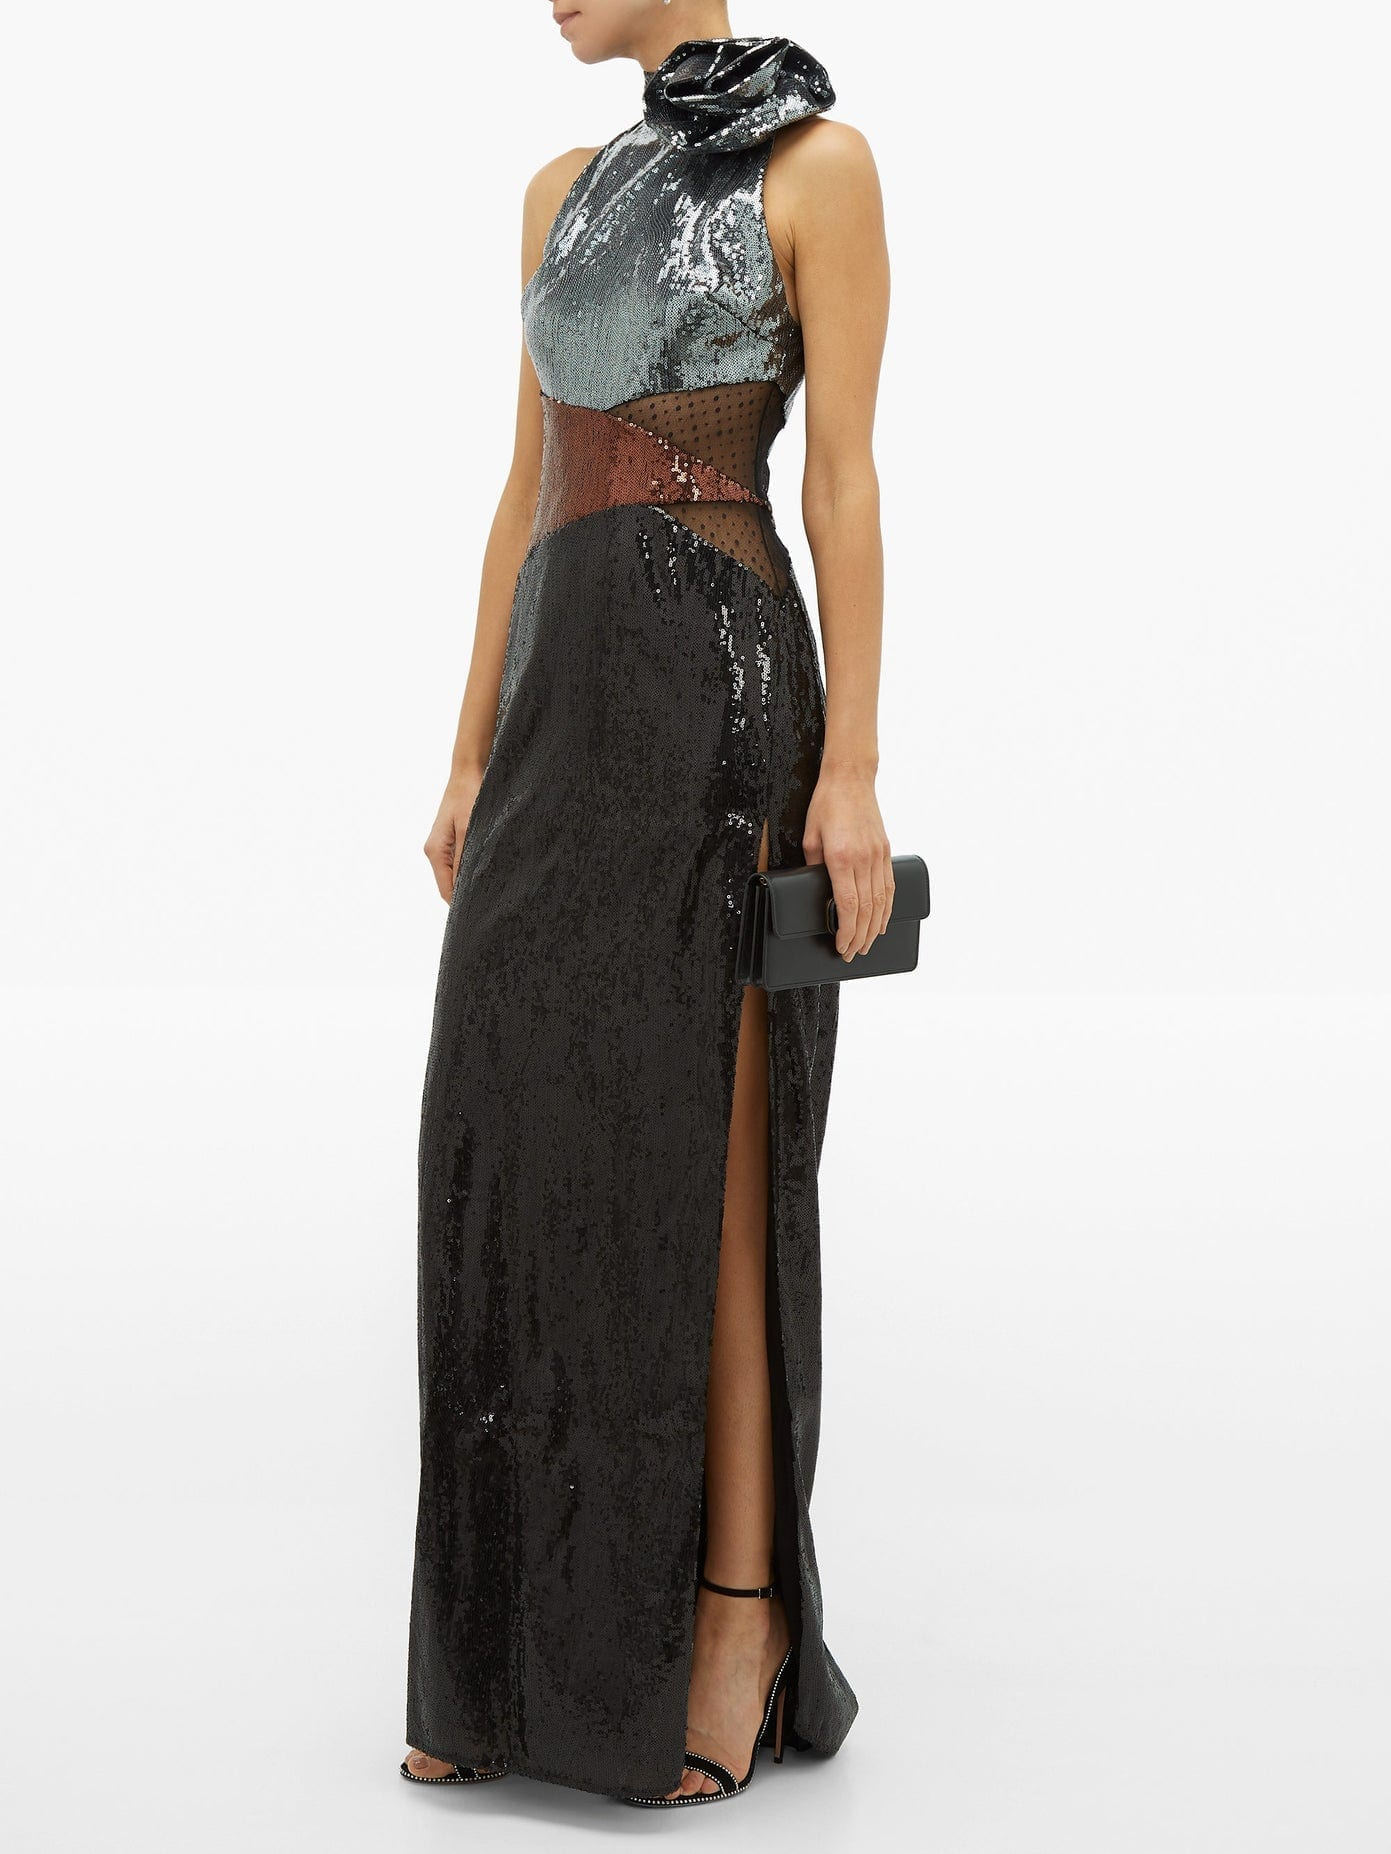 DUNDAS Rosette High-neck Sequinned Dress